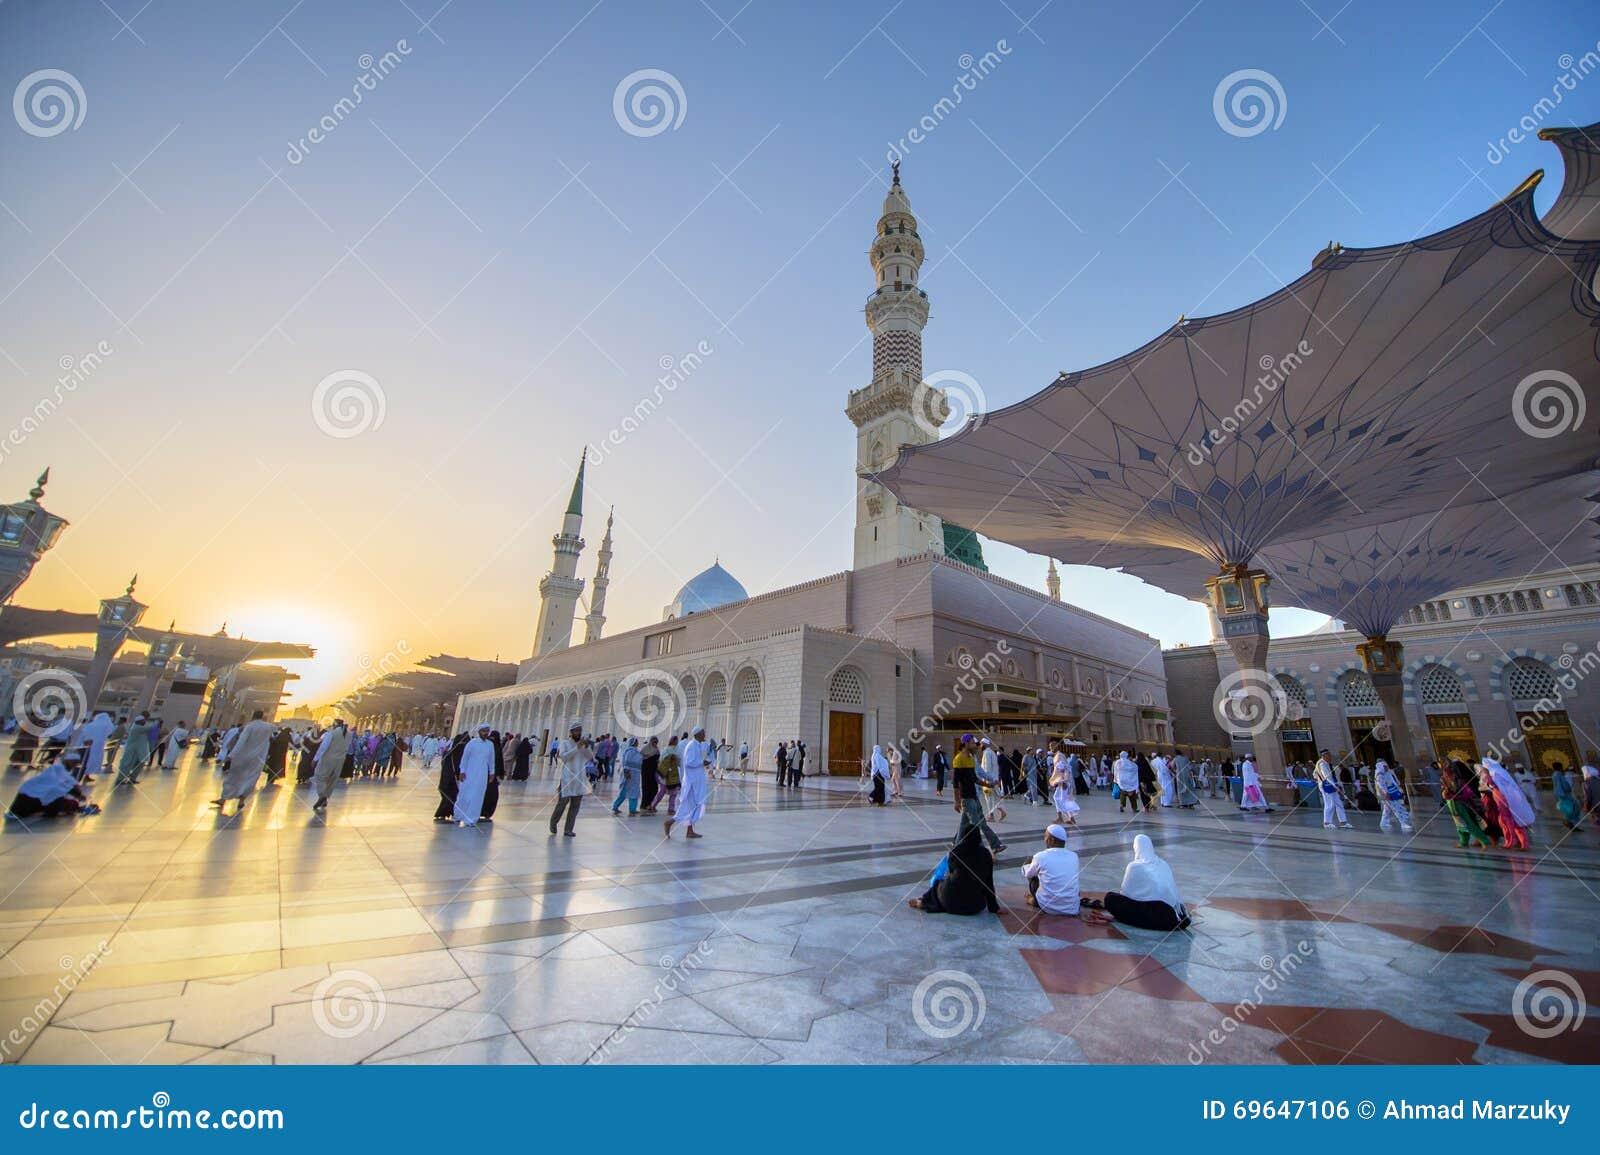 MEDINA, SAUDI-ARABIEN (KSA) - 21. MÄRZ: Sonnenuntergang an Nabawi-Moschee